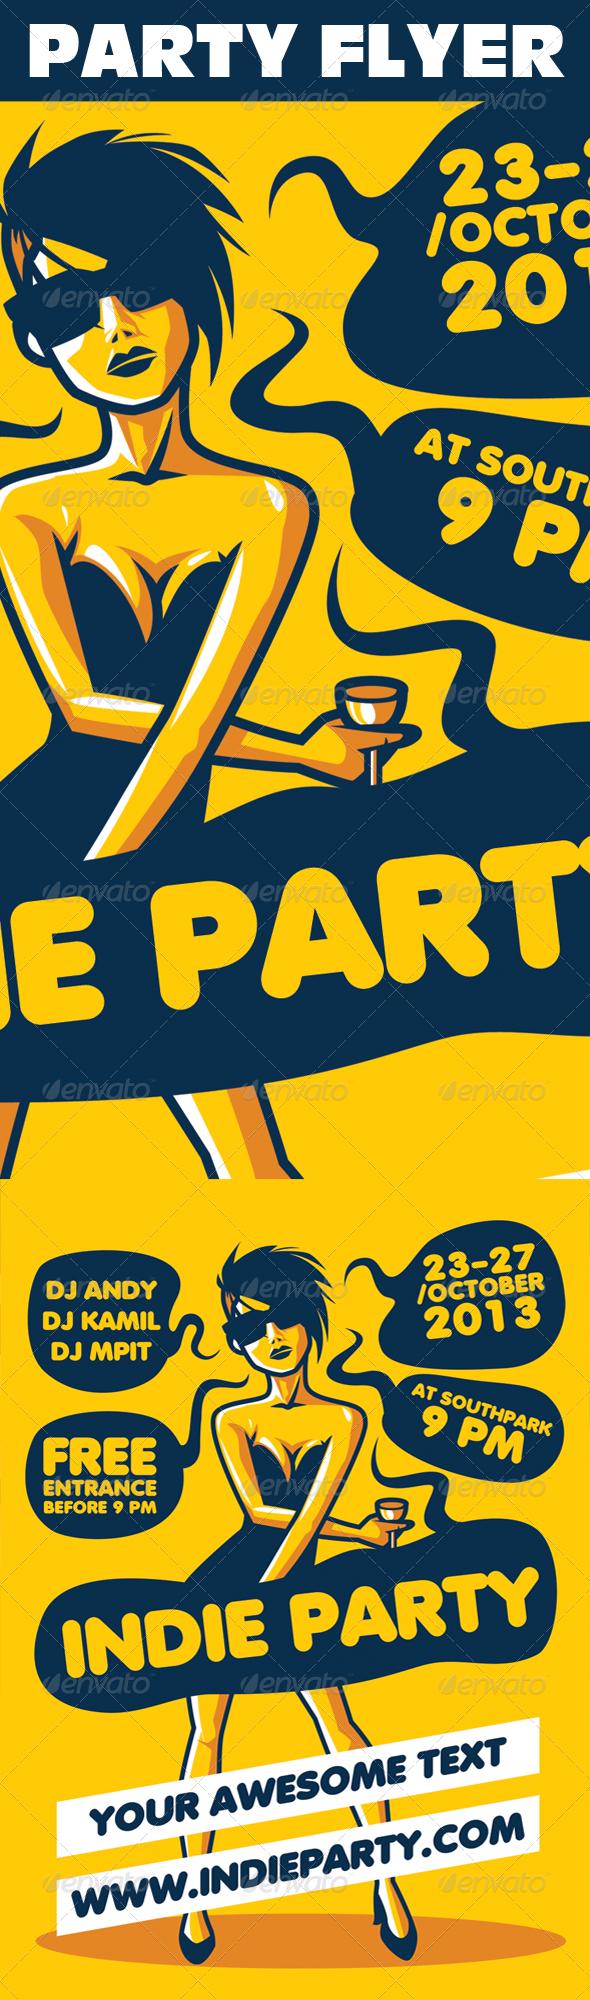 Indie Party Urban Flyer